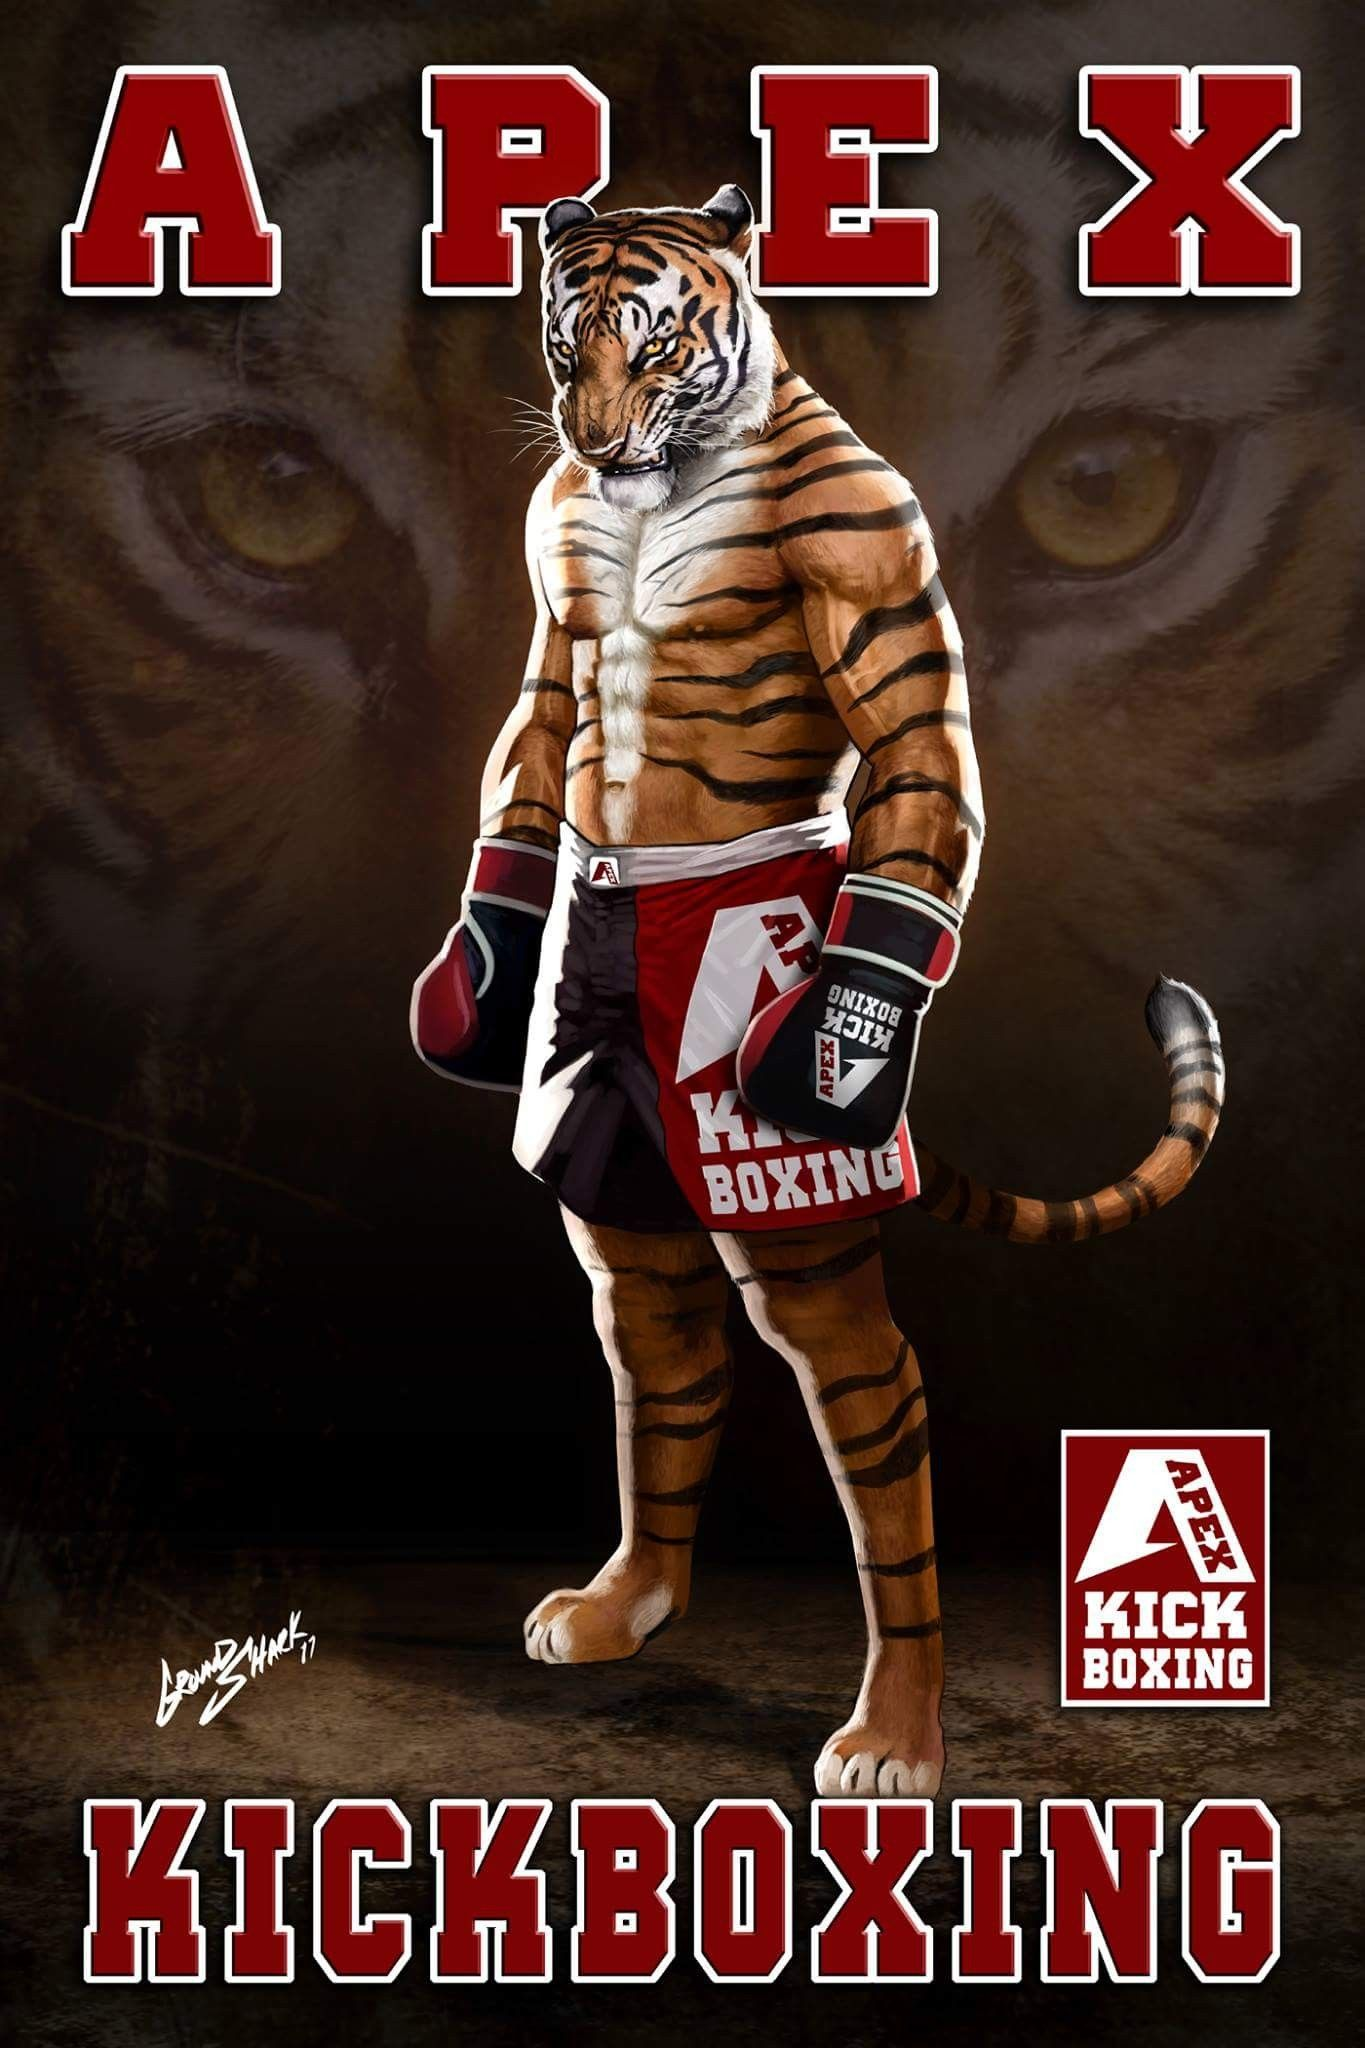 Pin by Jay Kowli on boxing | Muay thai martial arts, Mixed ...